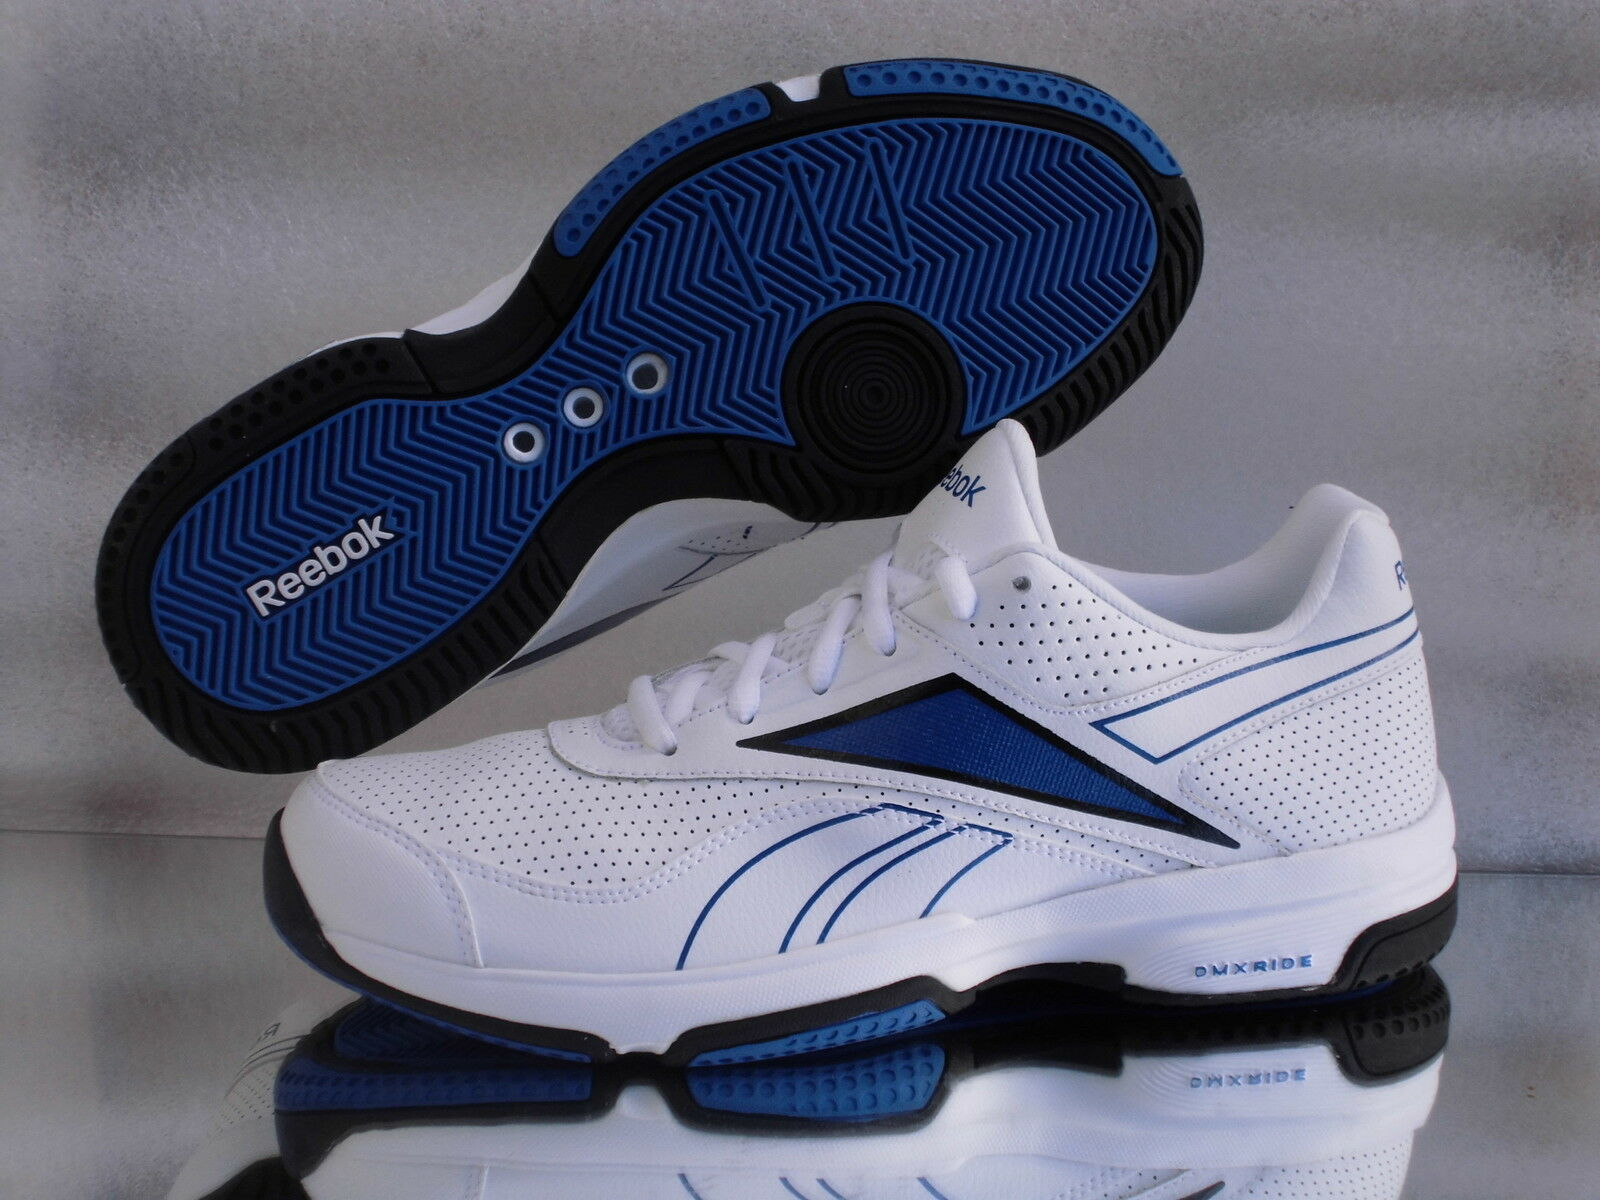 REEBOK HIGH VOLLEY VI Turnschuhe Tennis Sneaker J81591 Weiß/Blau Neu